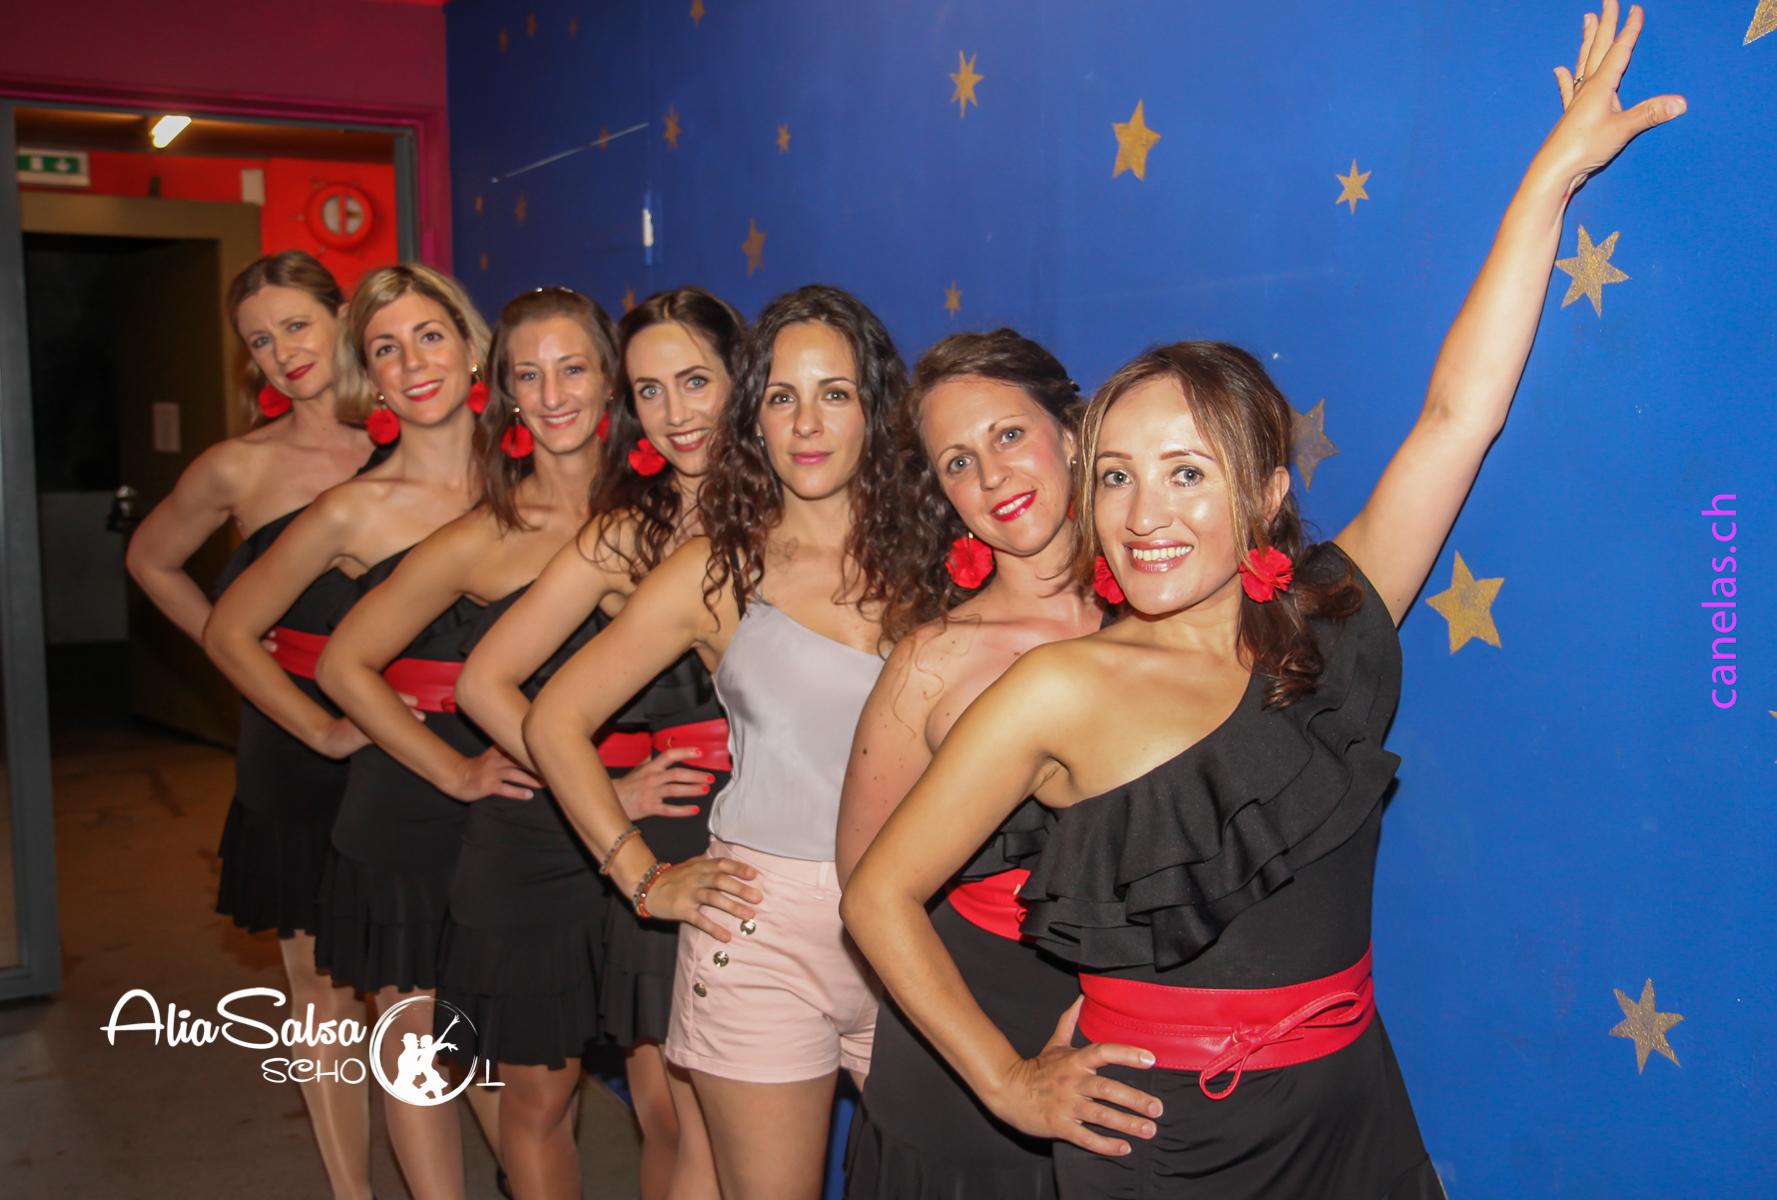 AliaSalsa ecole de danse lausanne soiree bachata salsa cubaineAlia Salsa Soireé Salsa - Bachata-12